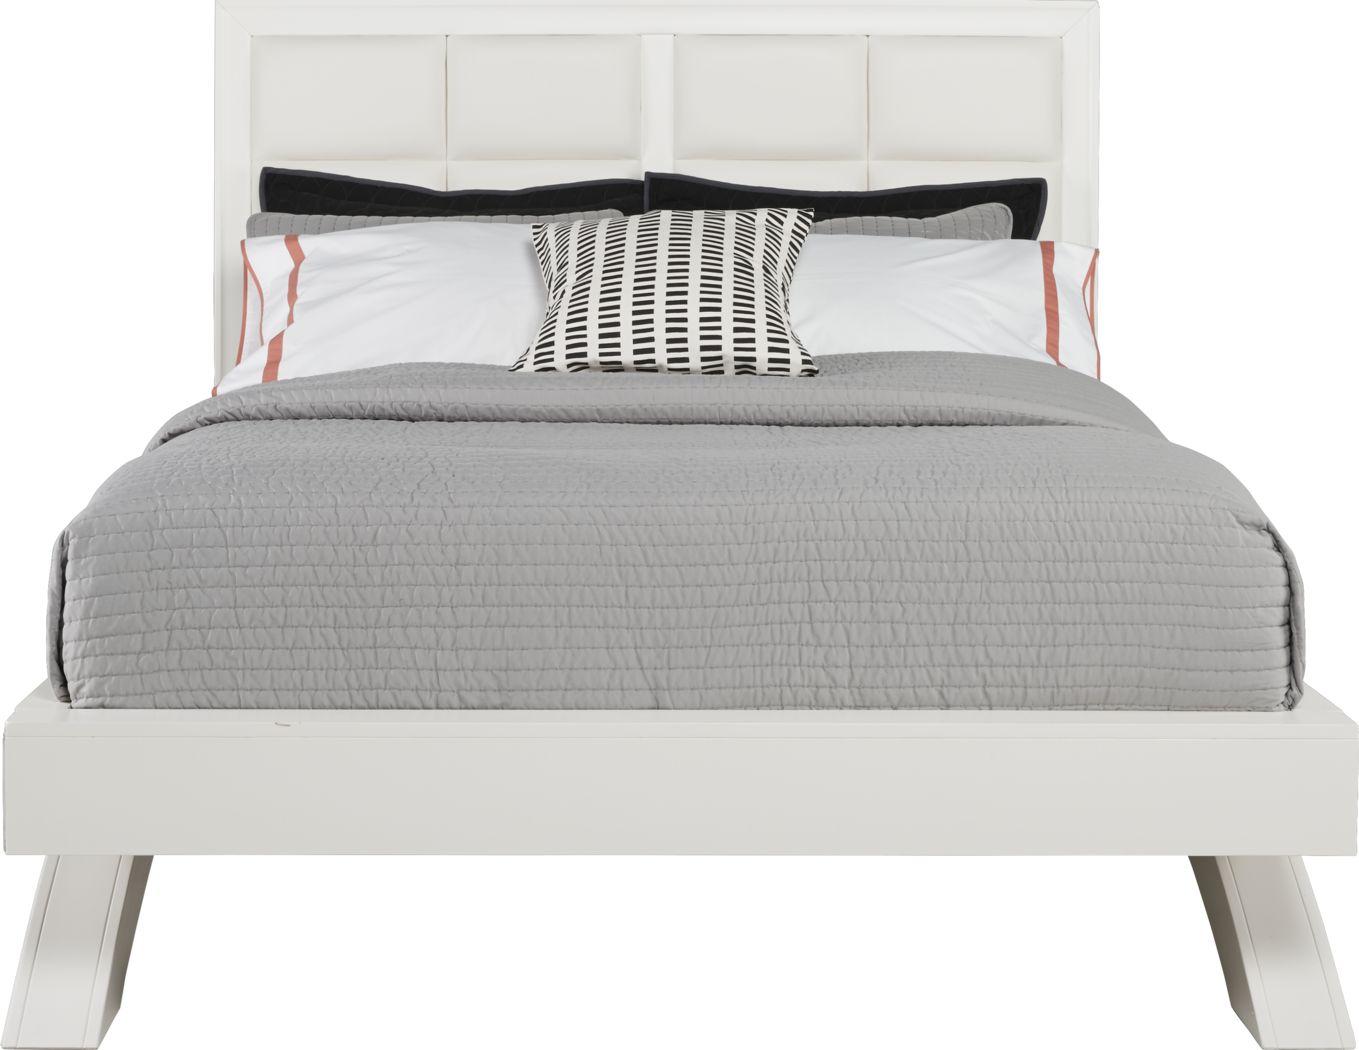 Belcourt White 3 Pc King Upholstered Platform Bed